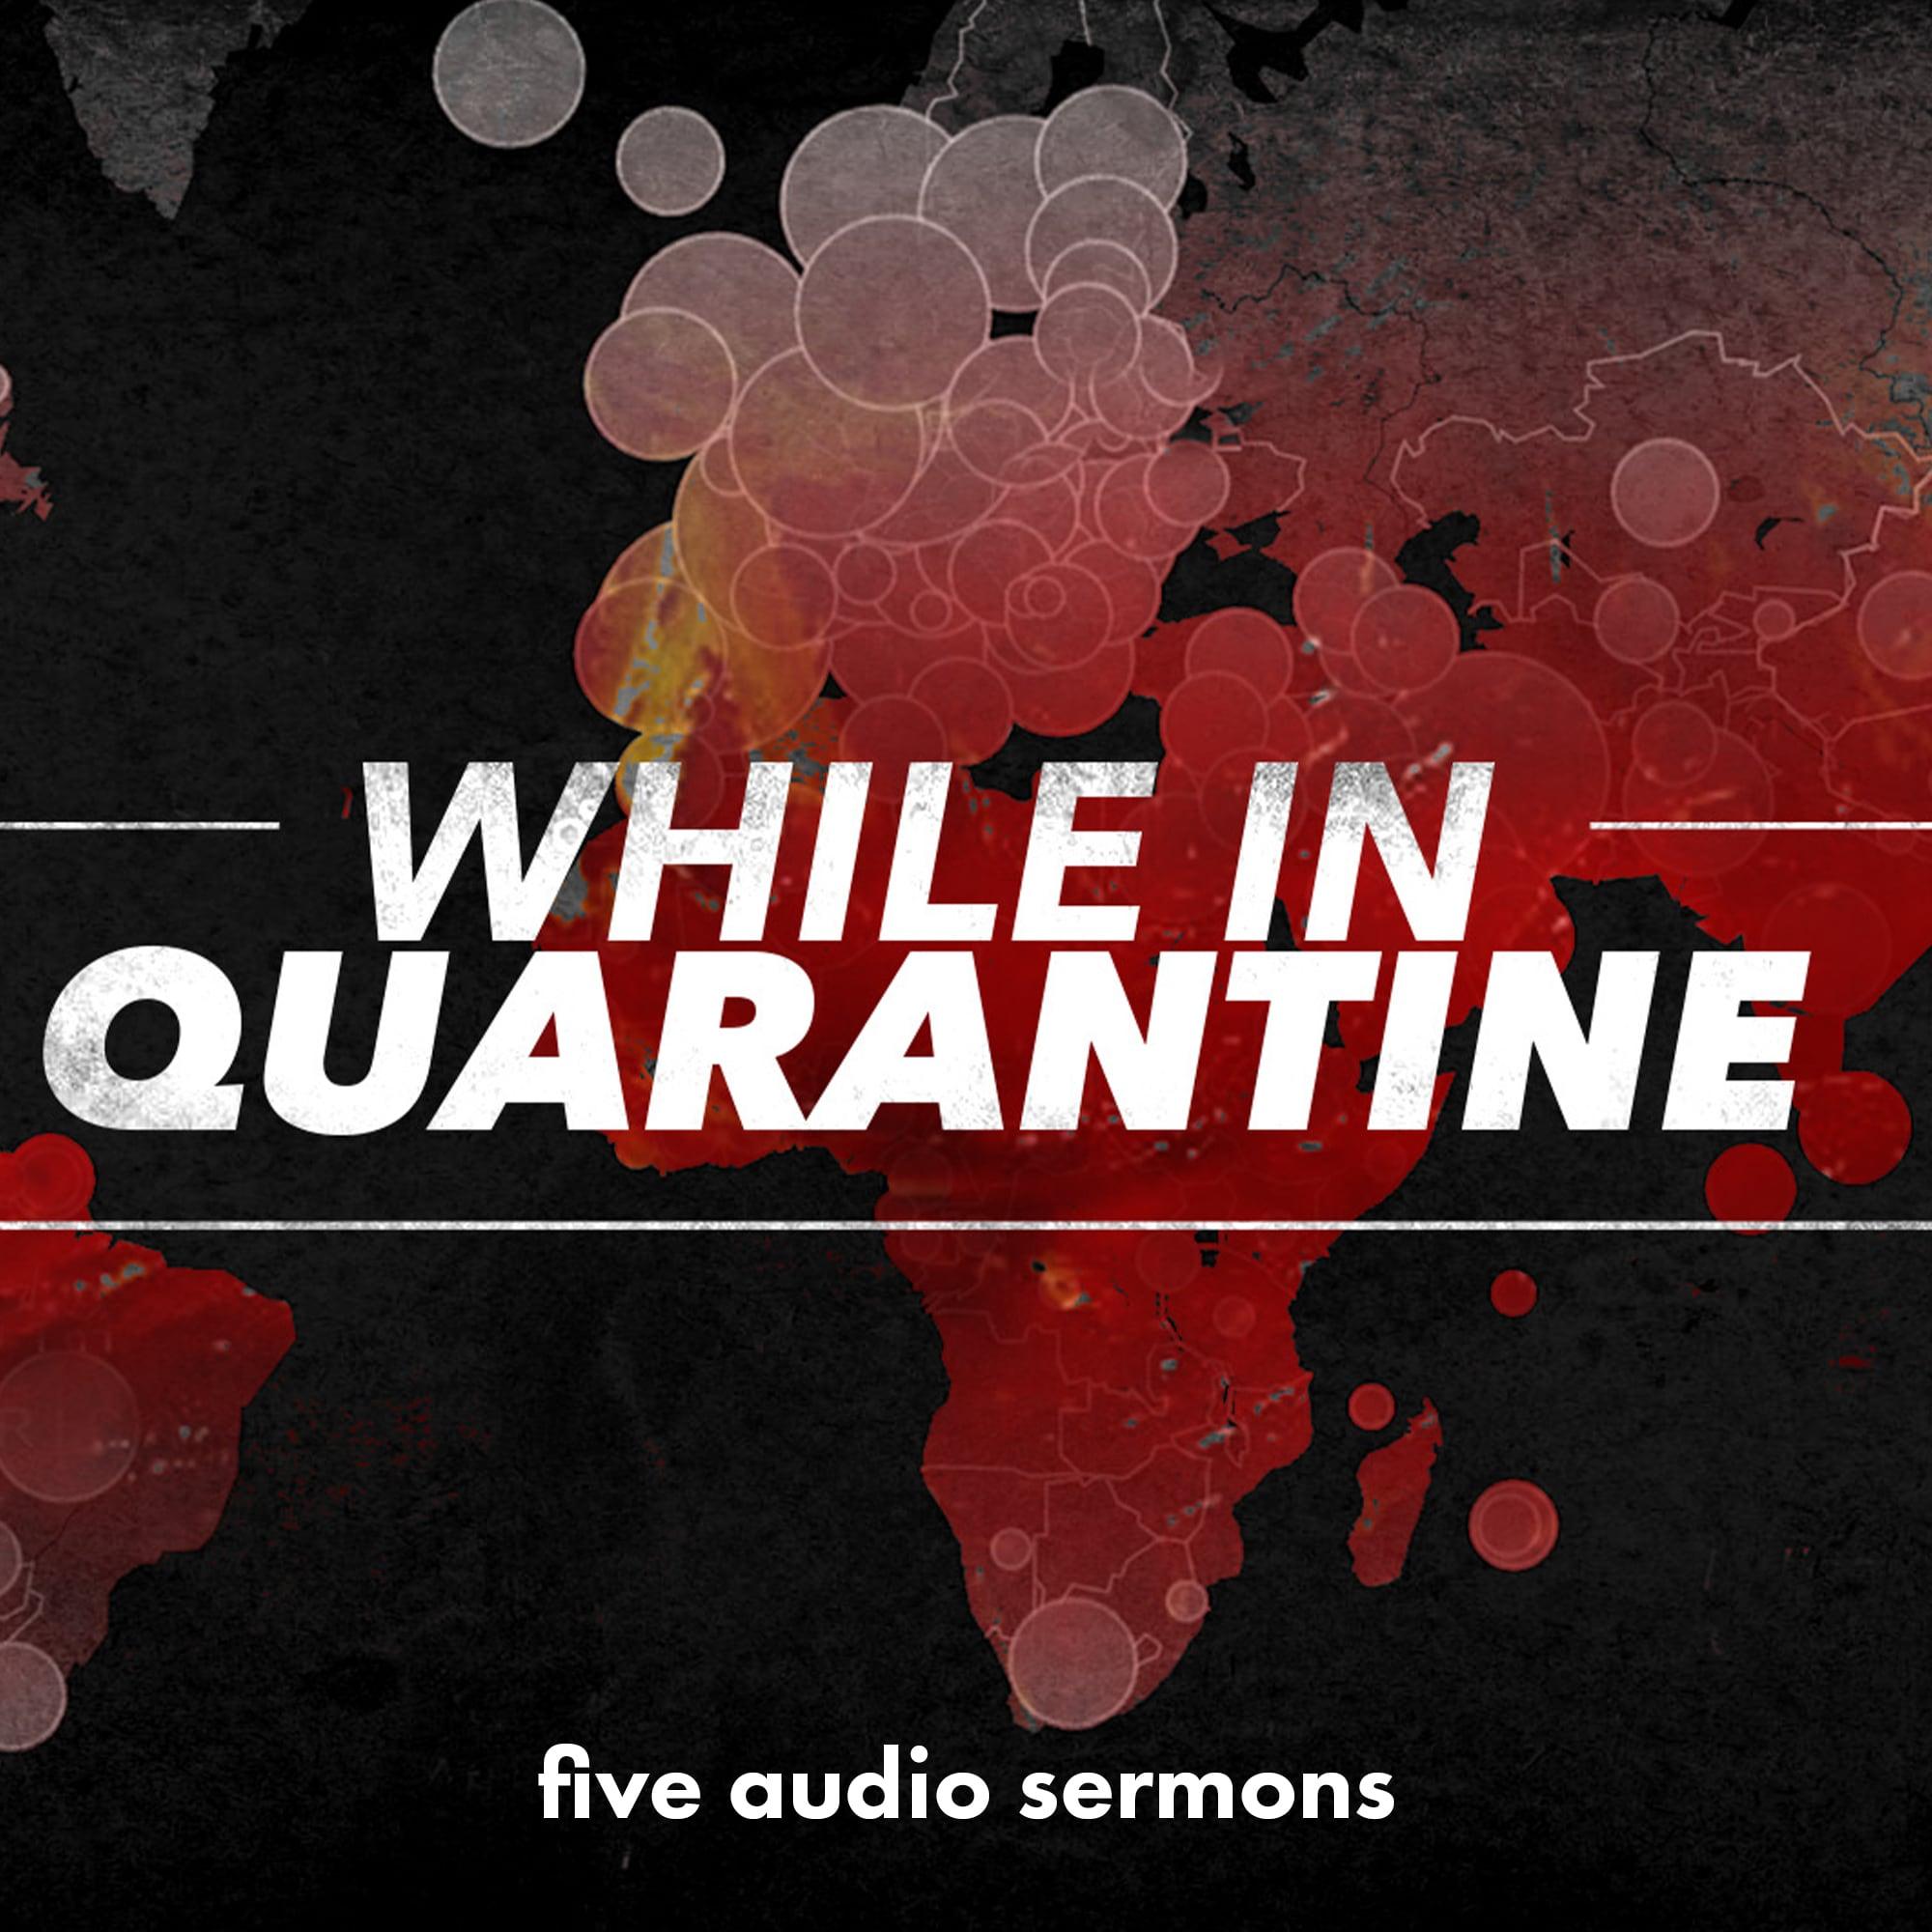 Series: While in Quarantine